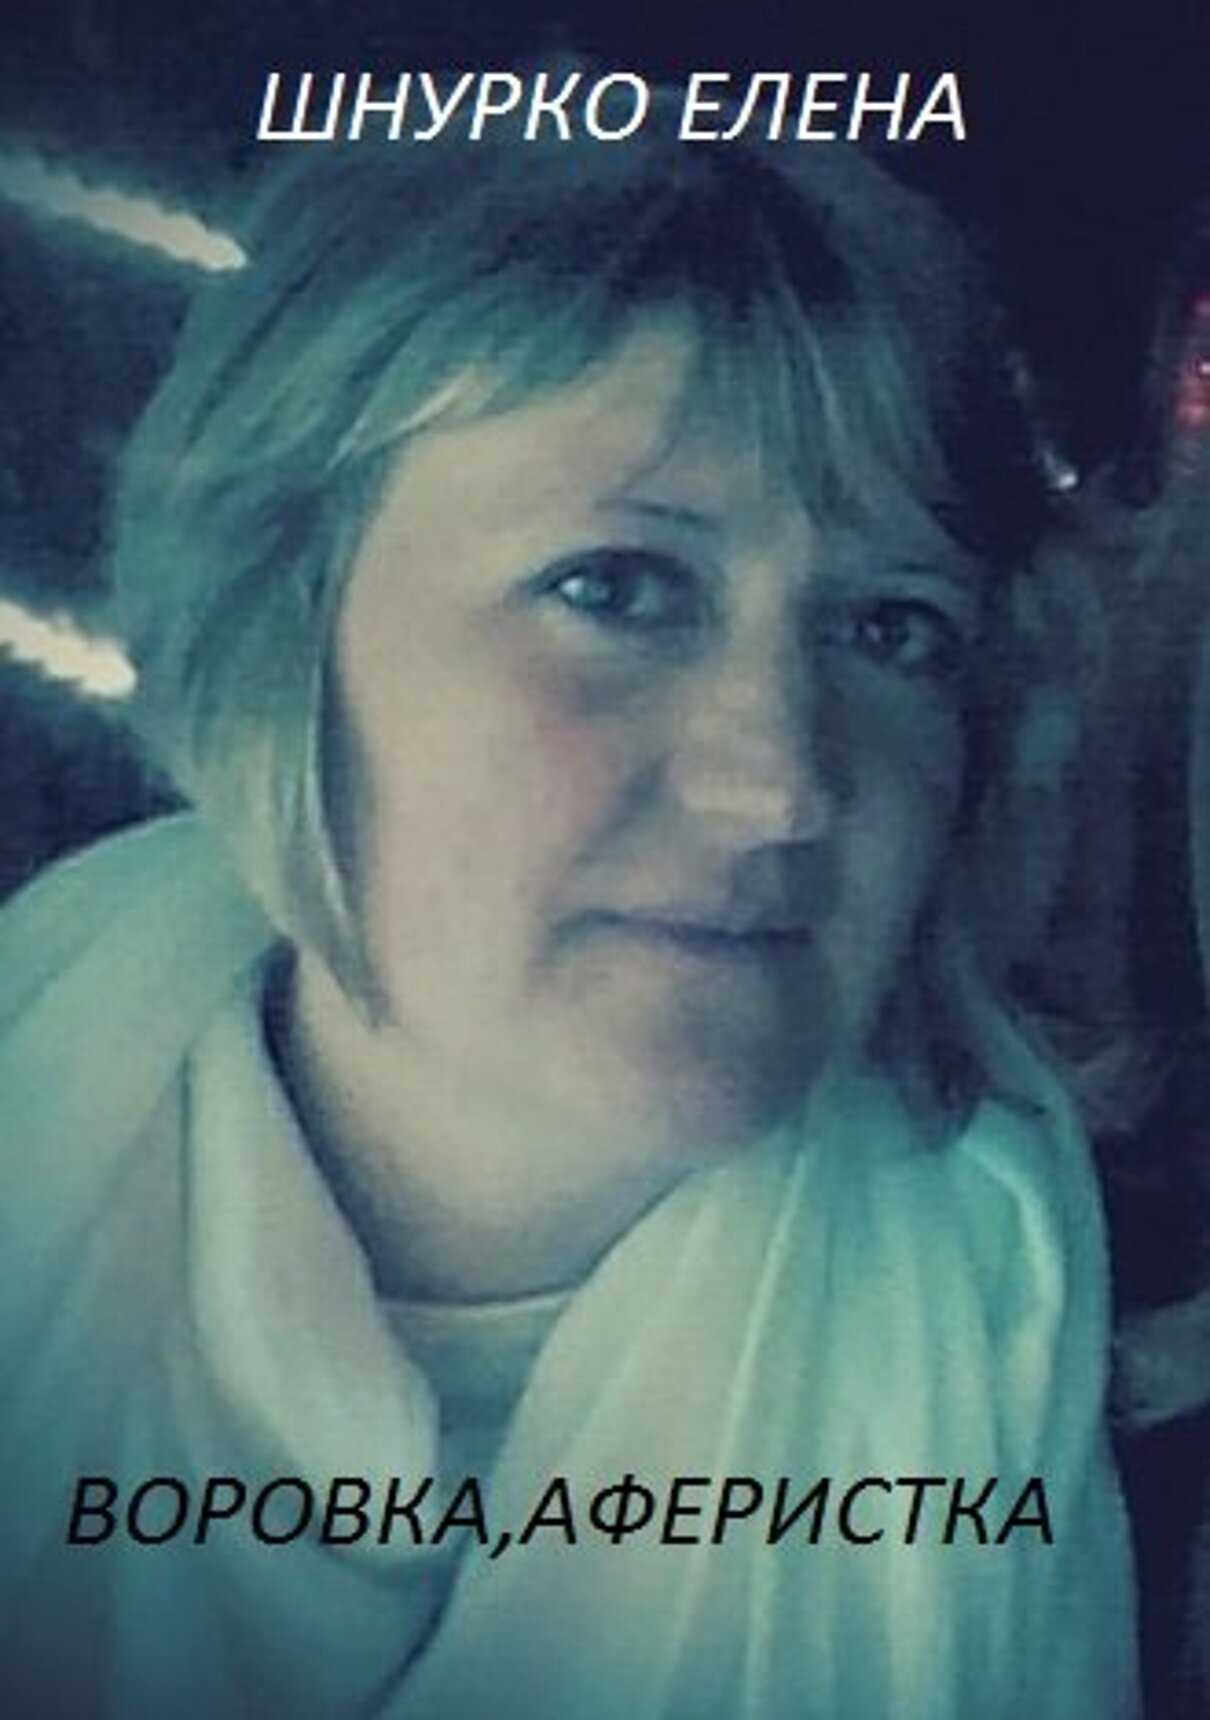 Жалоба-отзыв: Шнурко Елена Викторовна - Воровка.Аферистка.  Фото №1